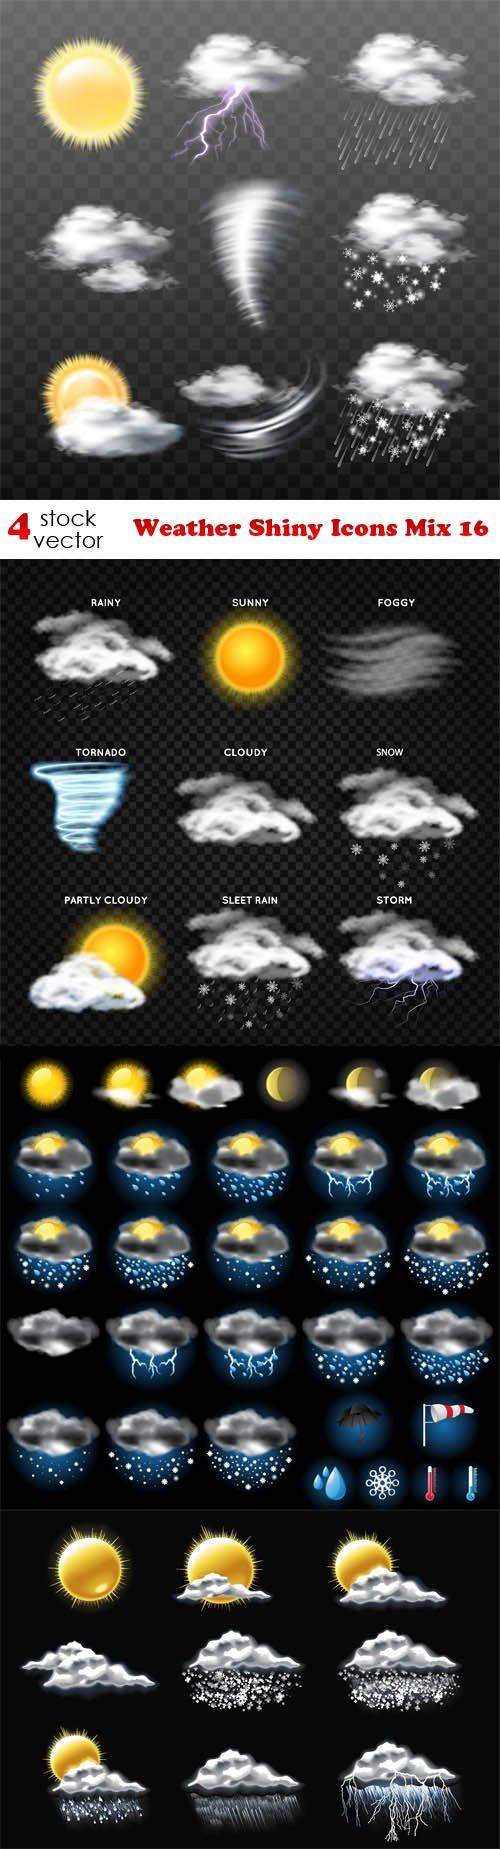 Vectors - Weather Shiny Icons Mix 16